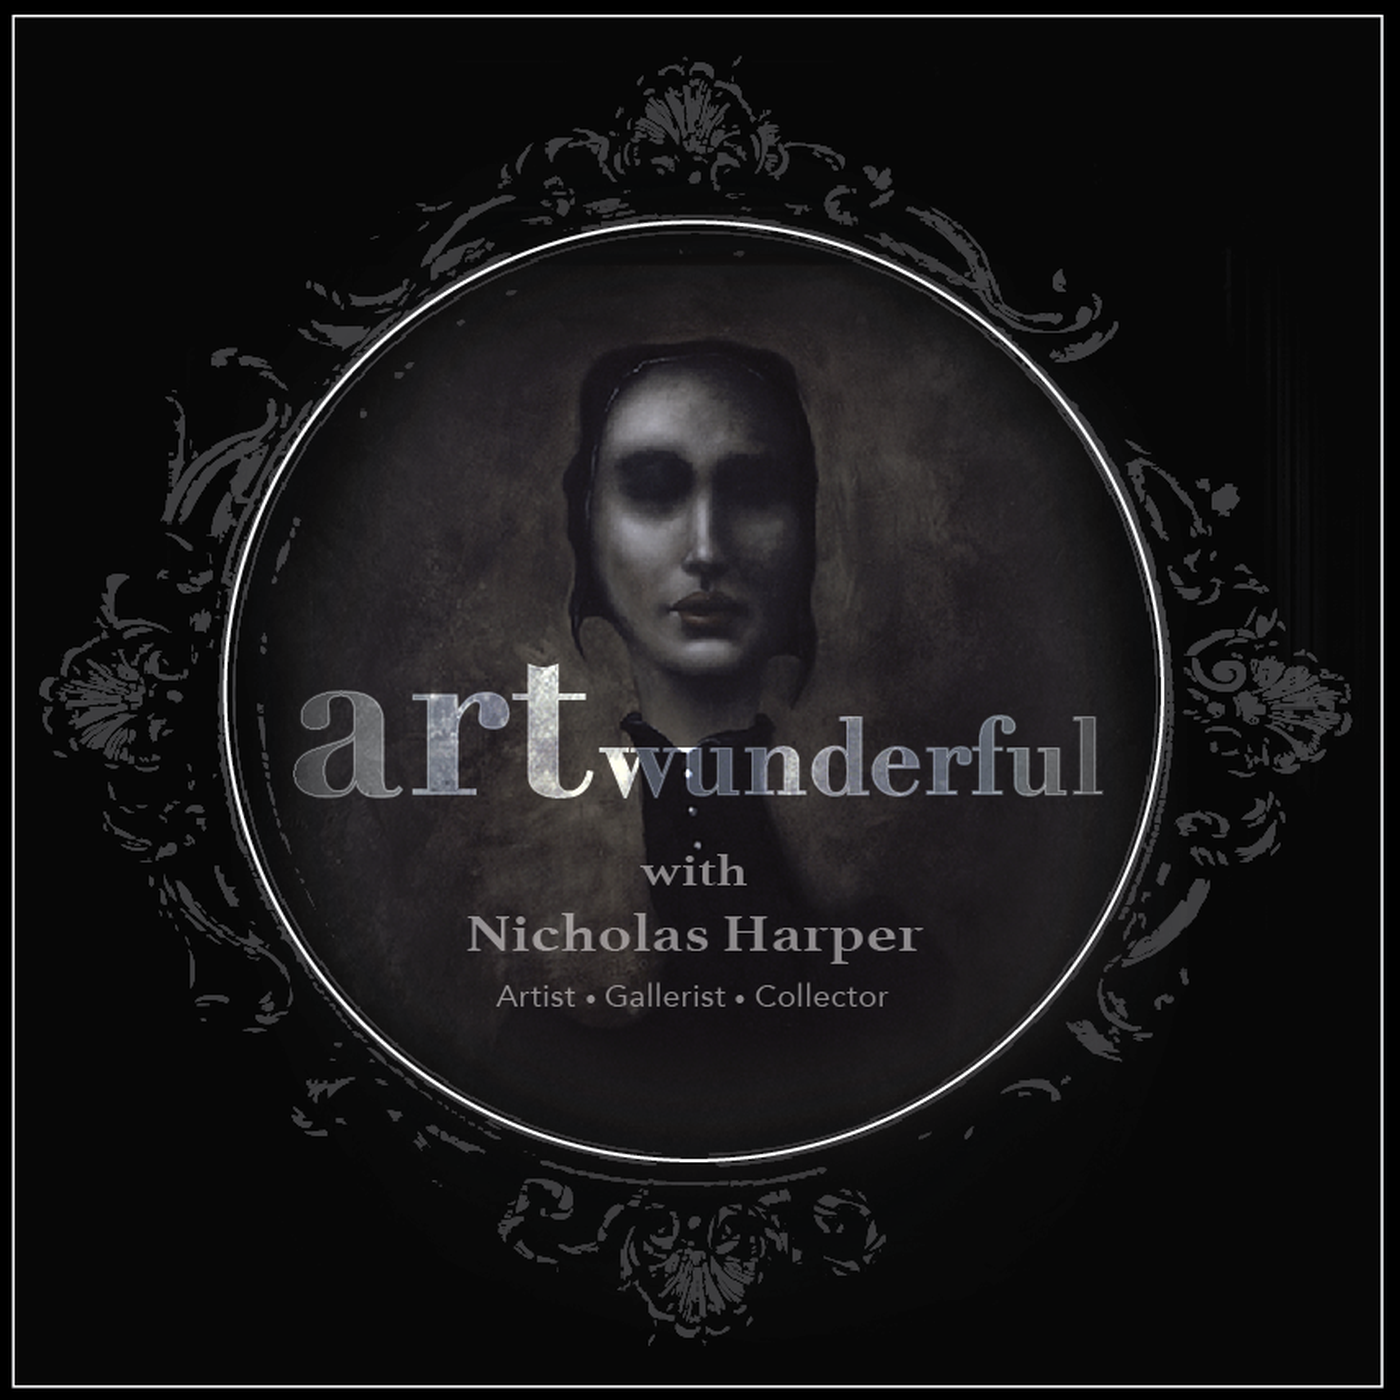 Art Wunderful